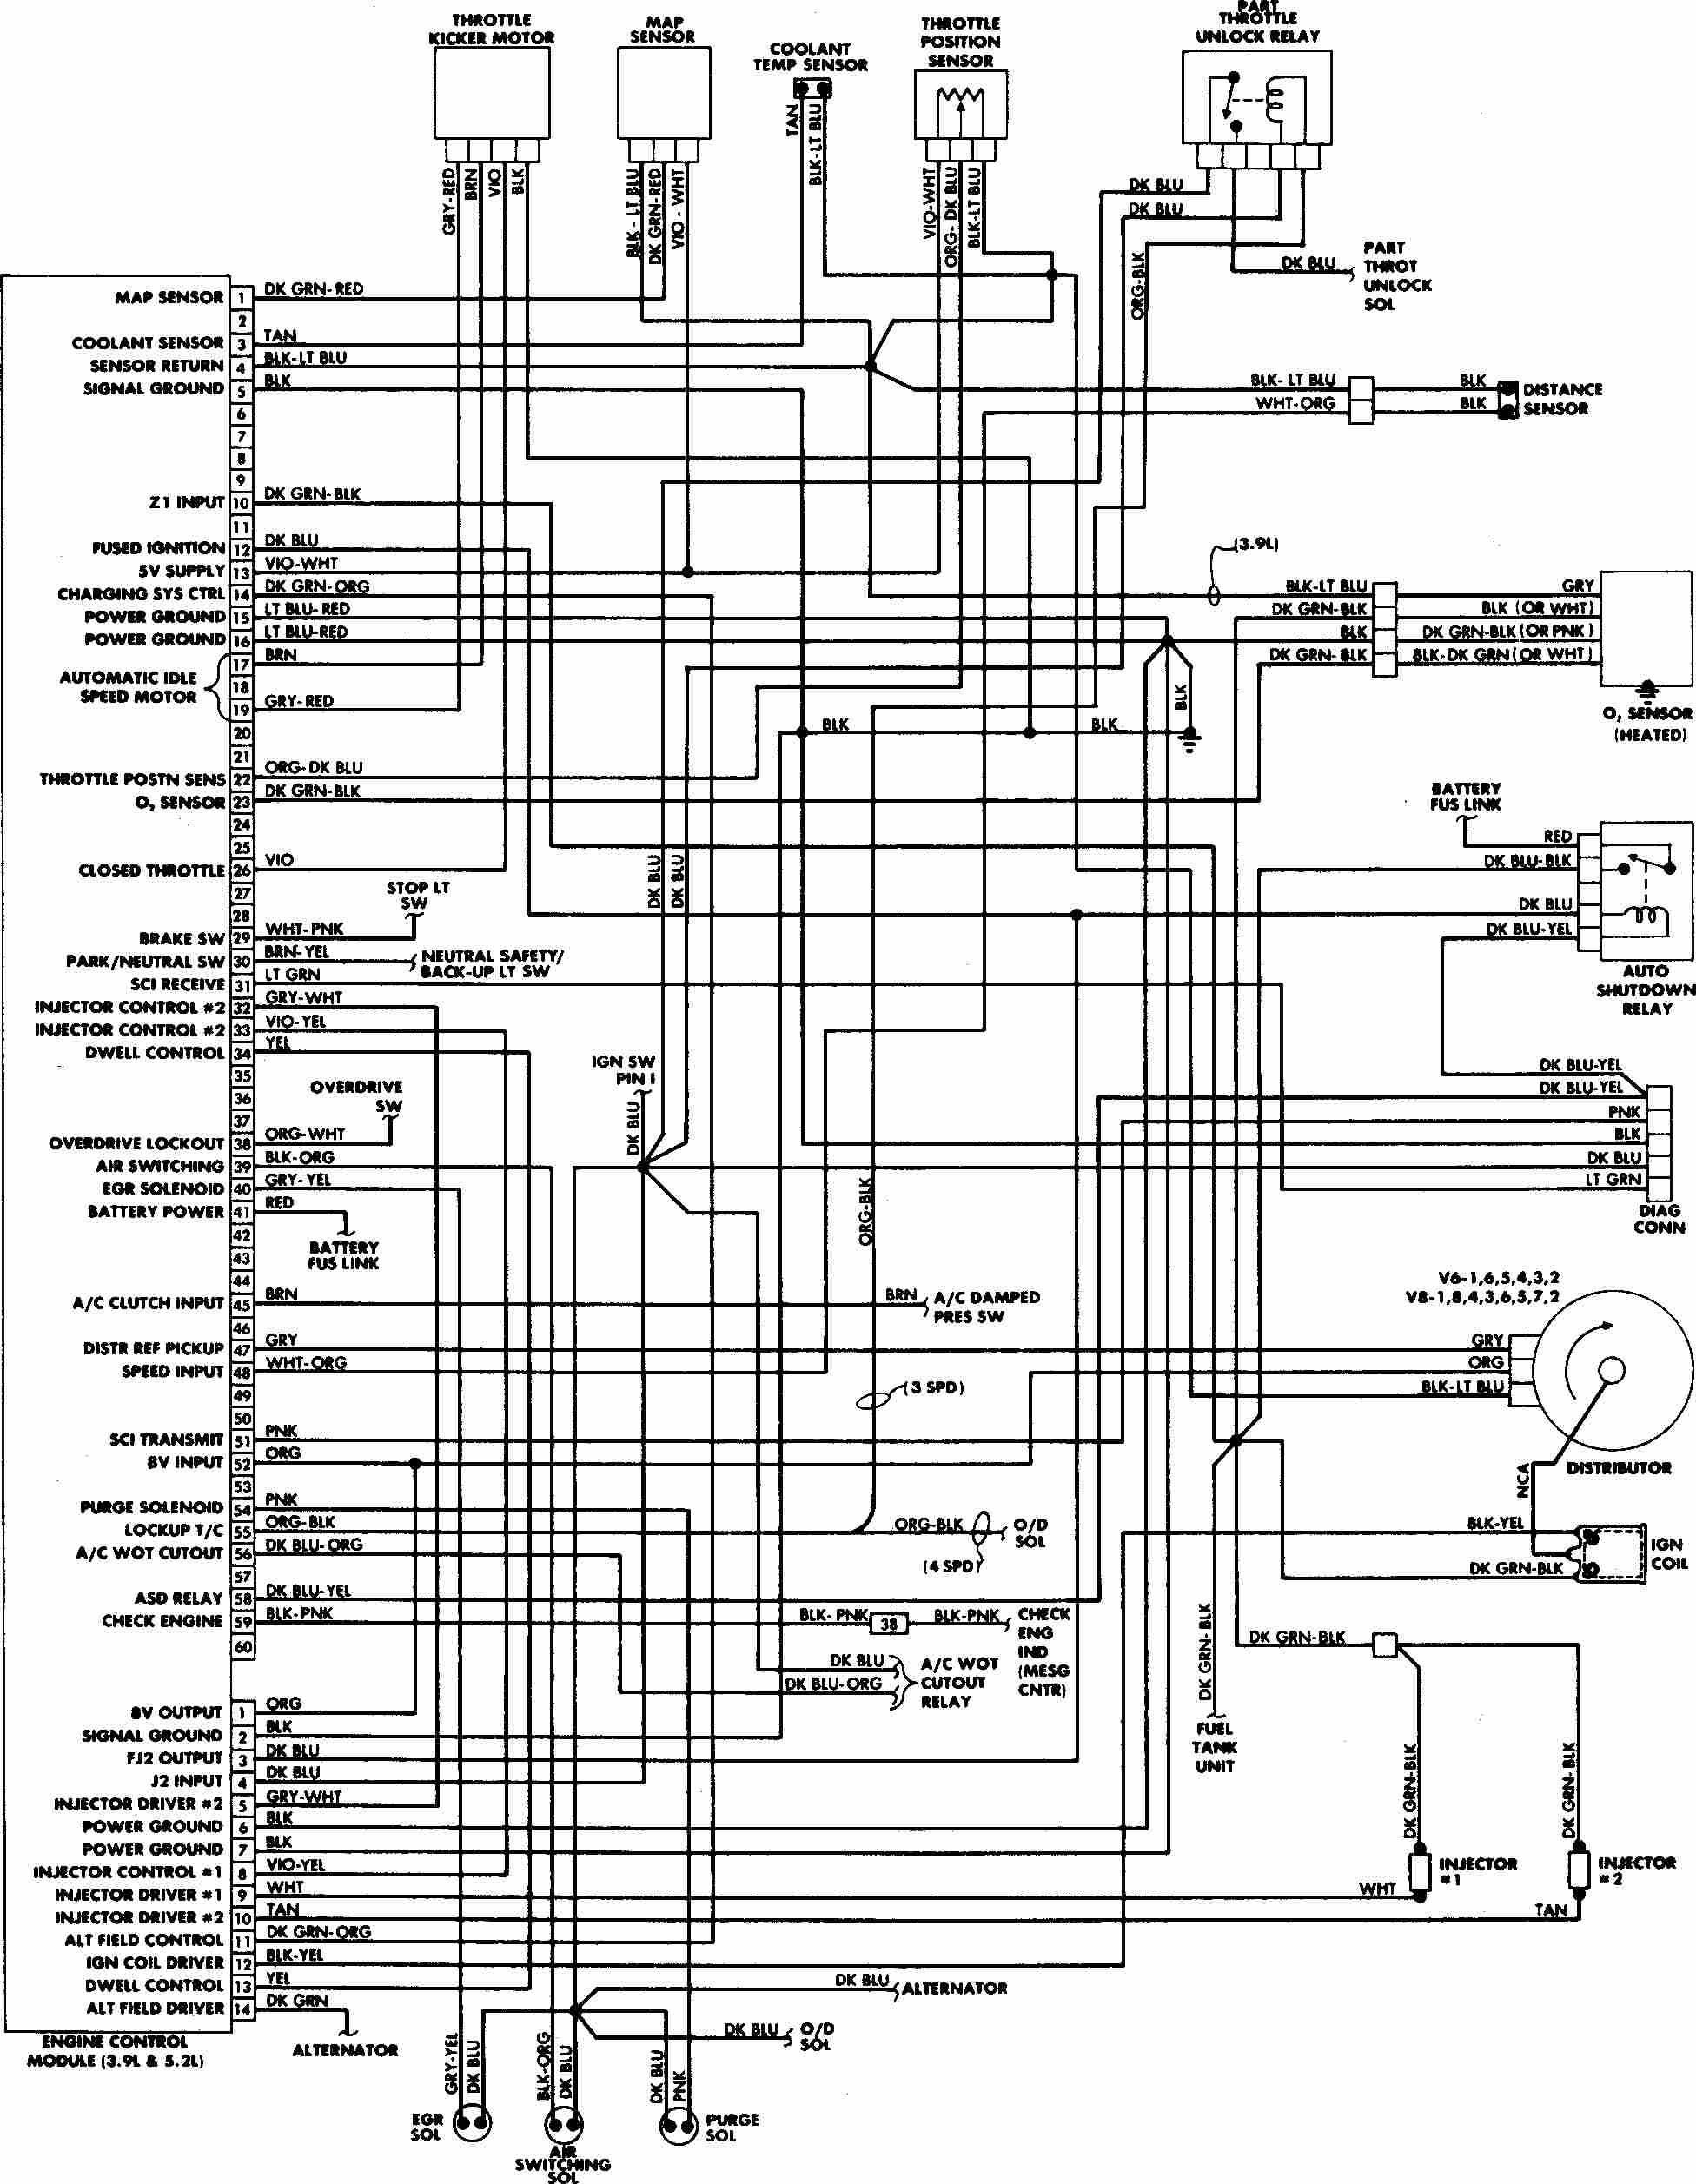 99 Jeep Wrangler Wiring Diagram Auto Electrical Wiring Diagram